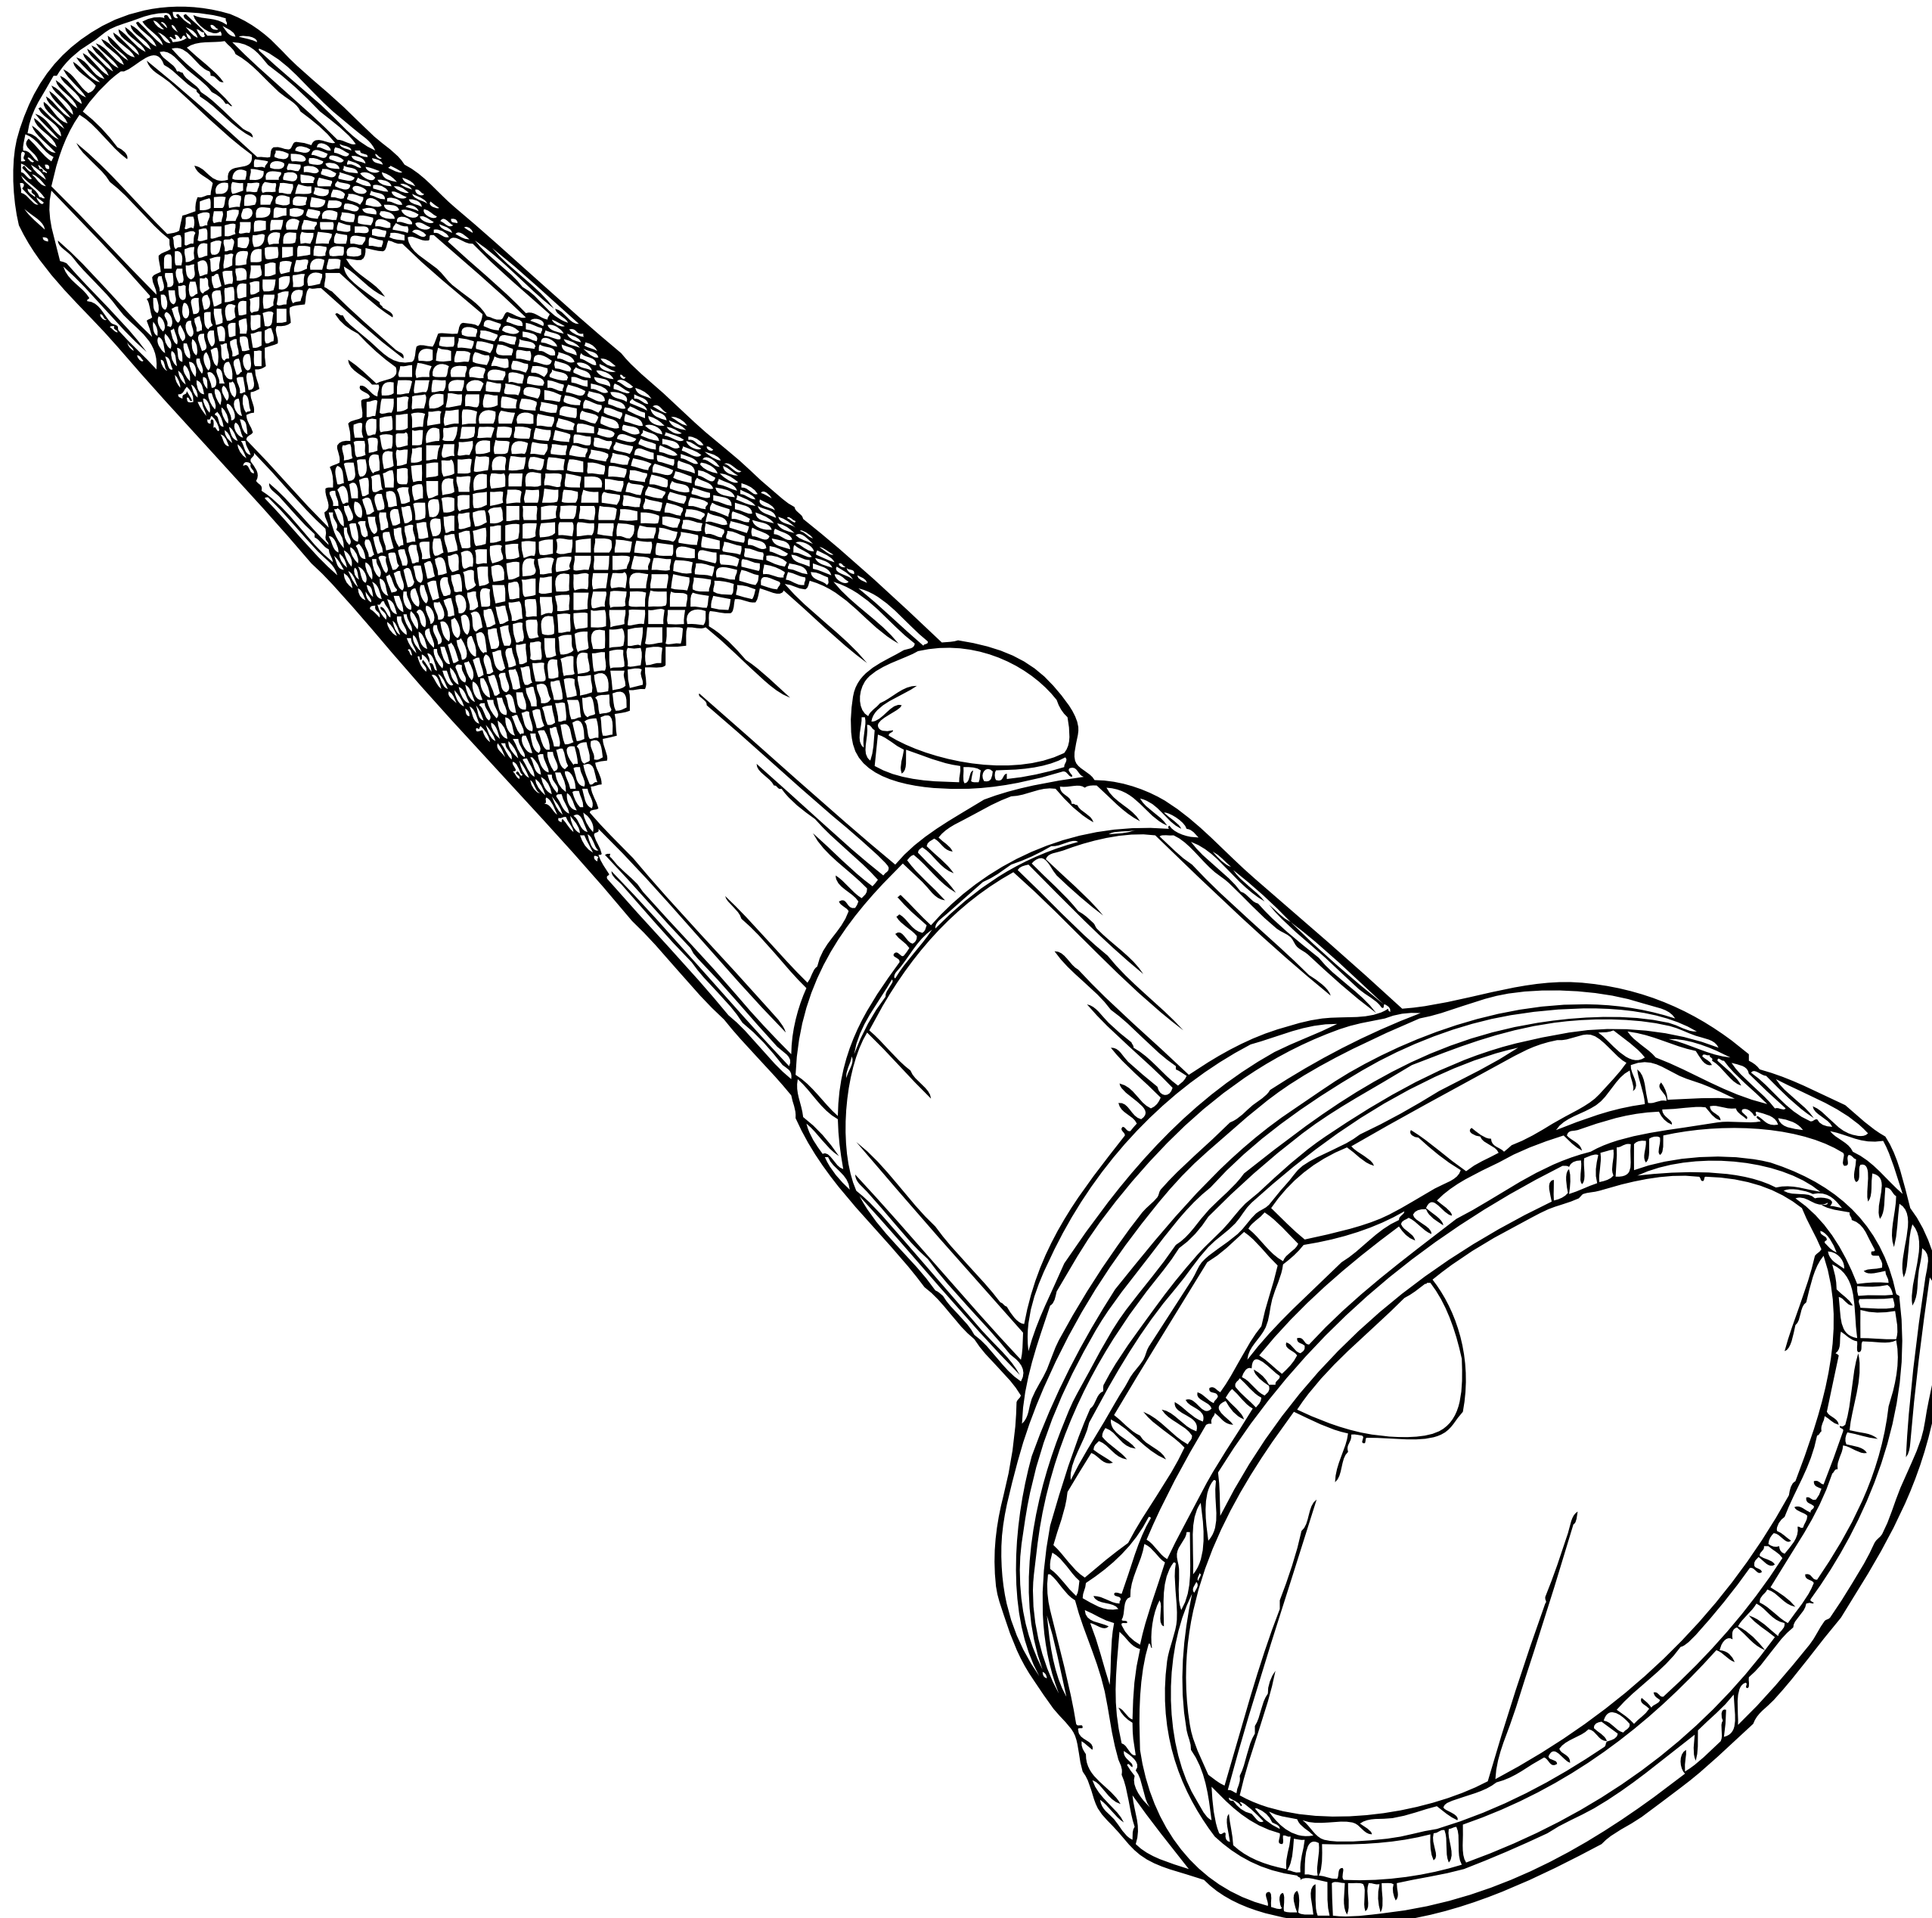 Flashlight merry clip art image 2